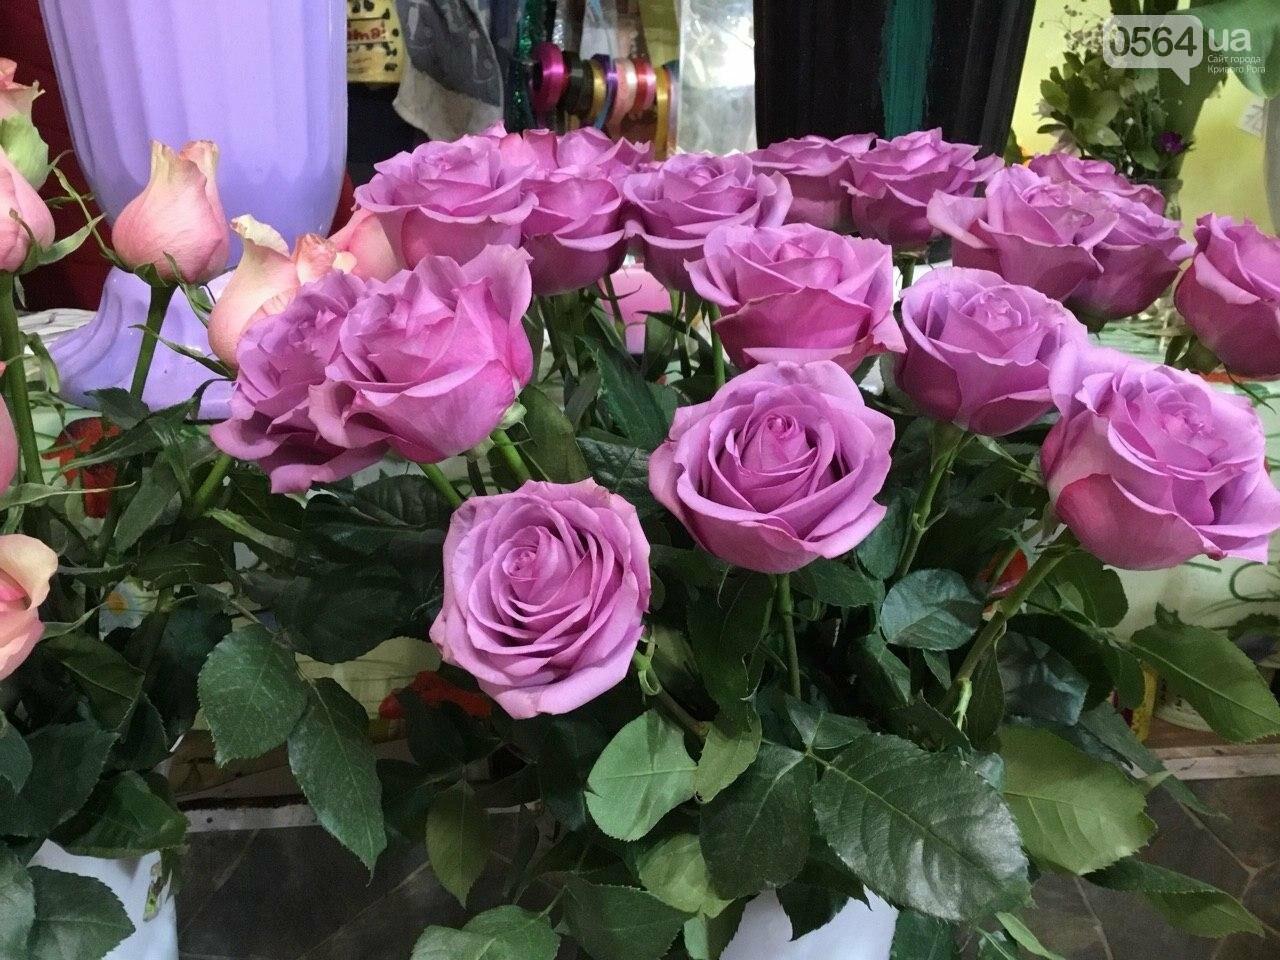 Сколько стоят примула, цикламен, мимоза? Обзор цен на цветы в Кривом Роге, - ФОТО, ВИДЕО, фото-5